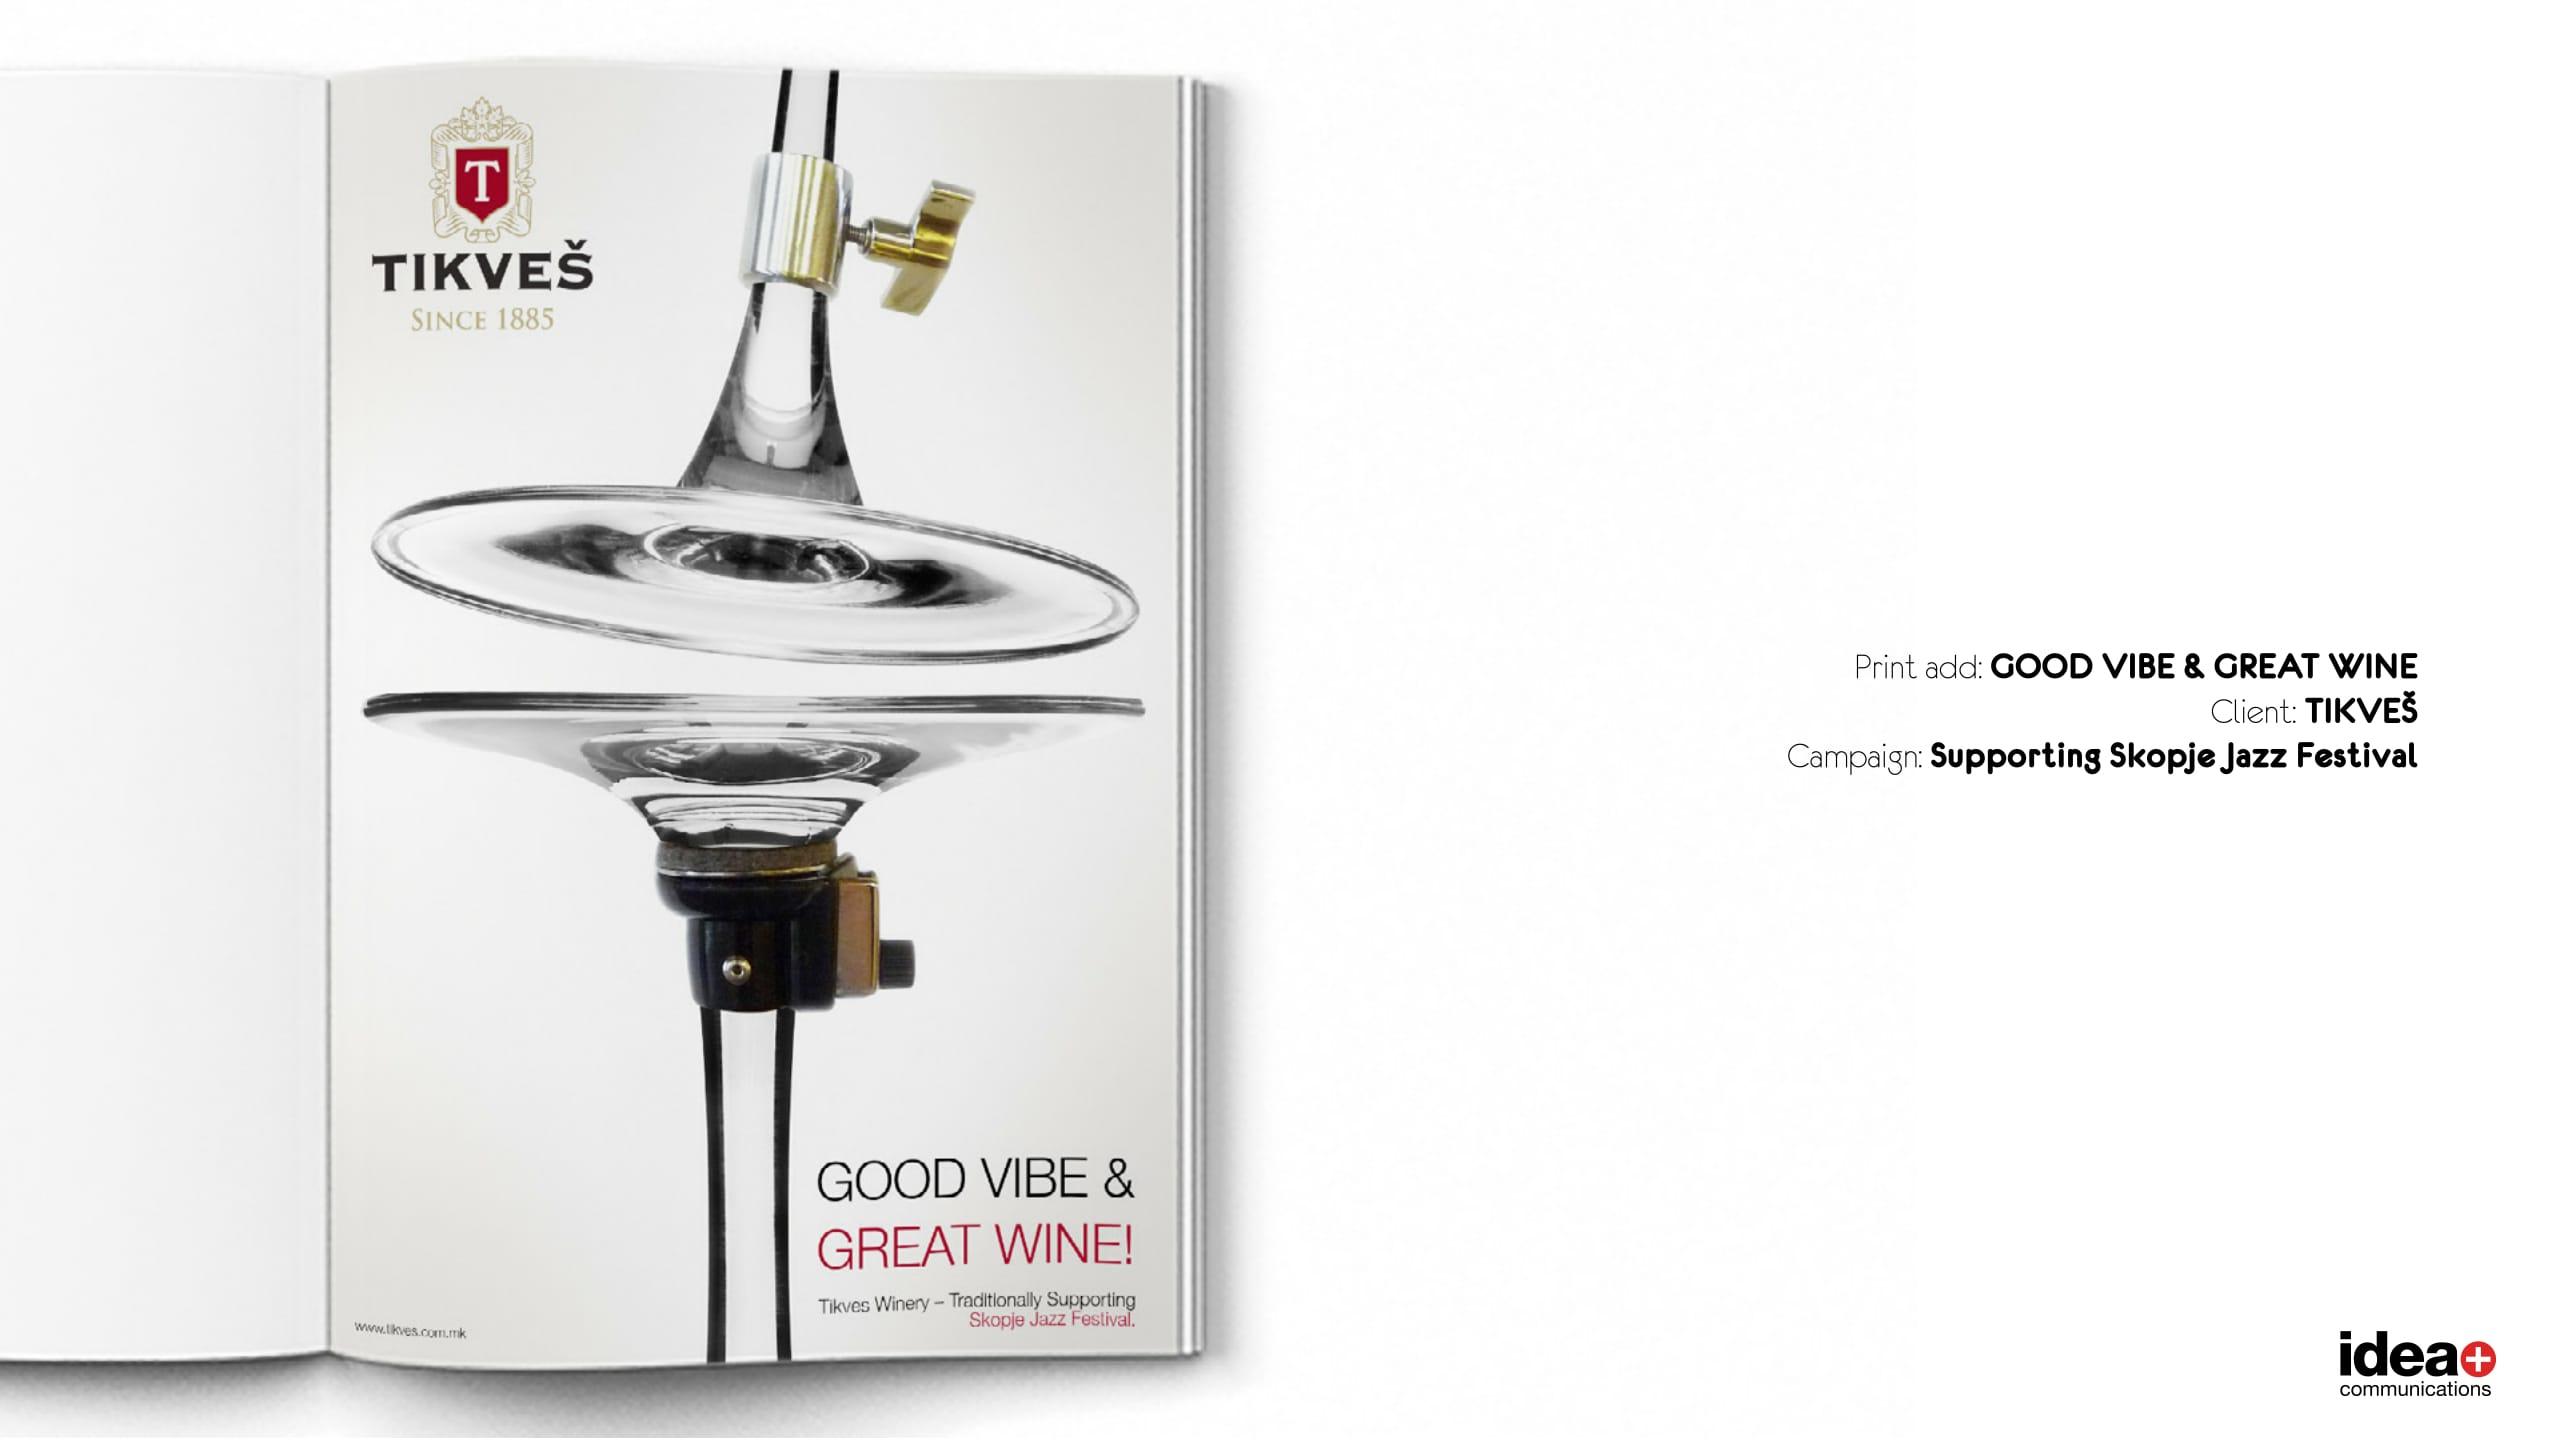 GOOD VIBE & GREAT WINE